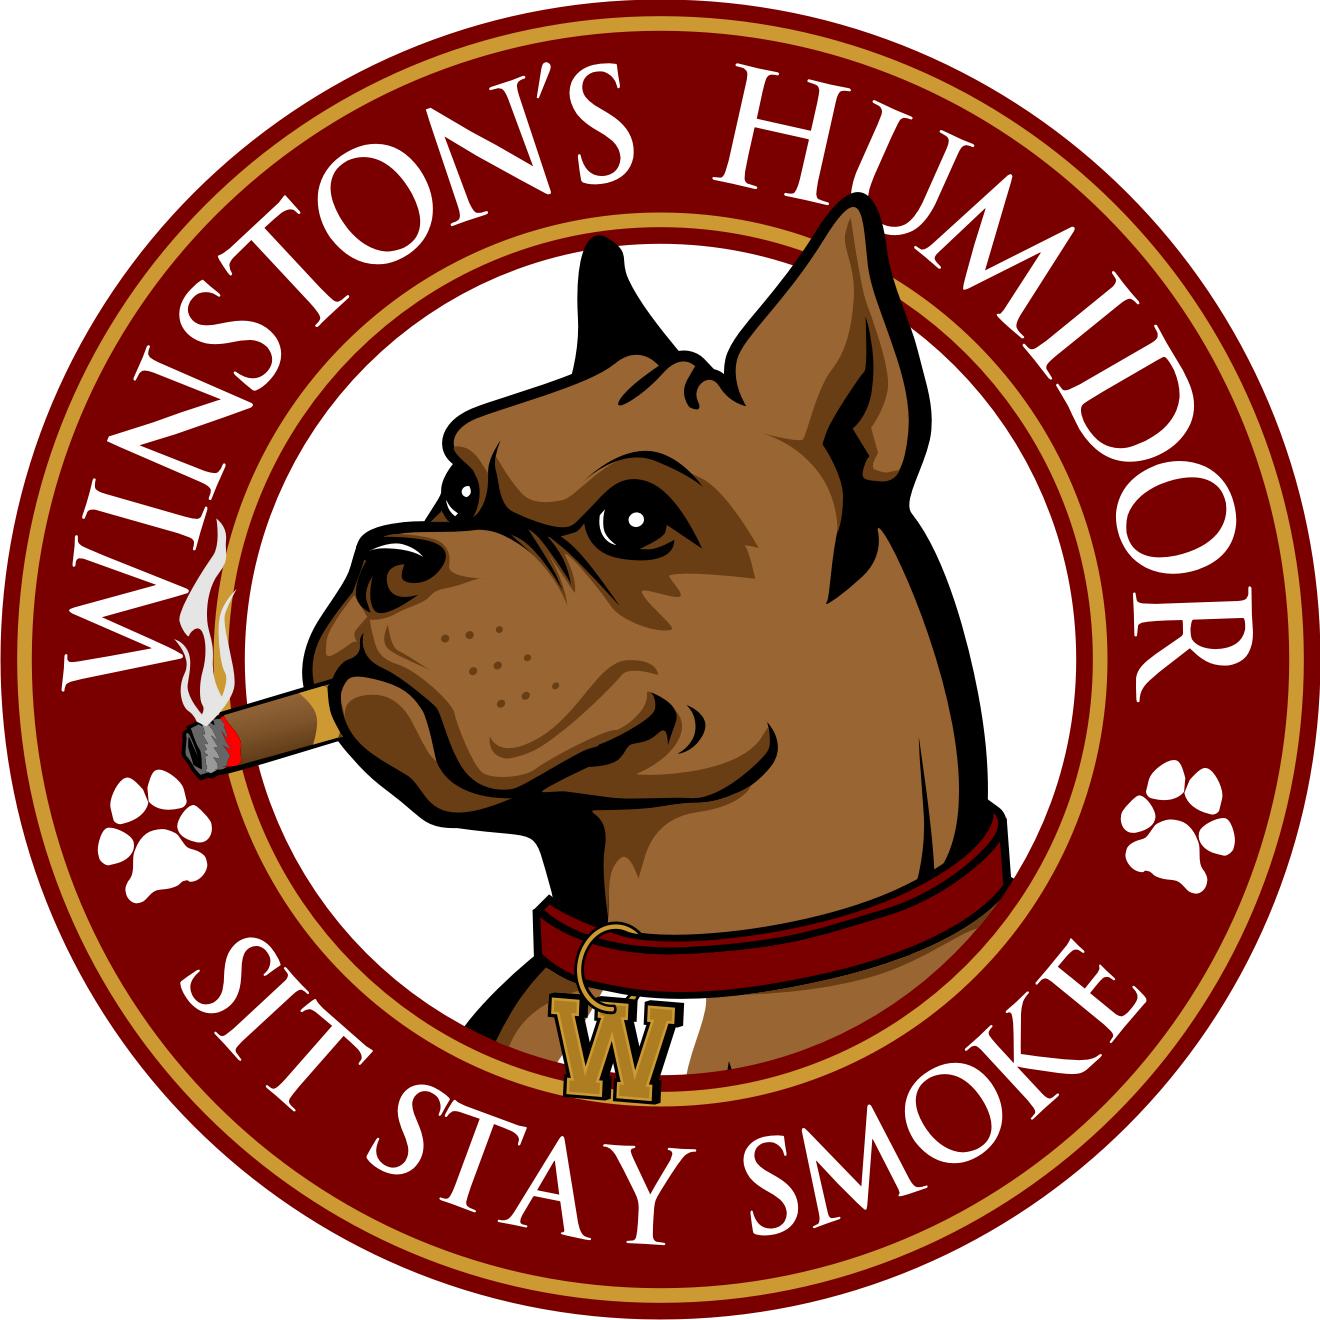 Winston's Humidor needs a new t-shirt design